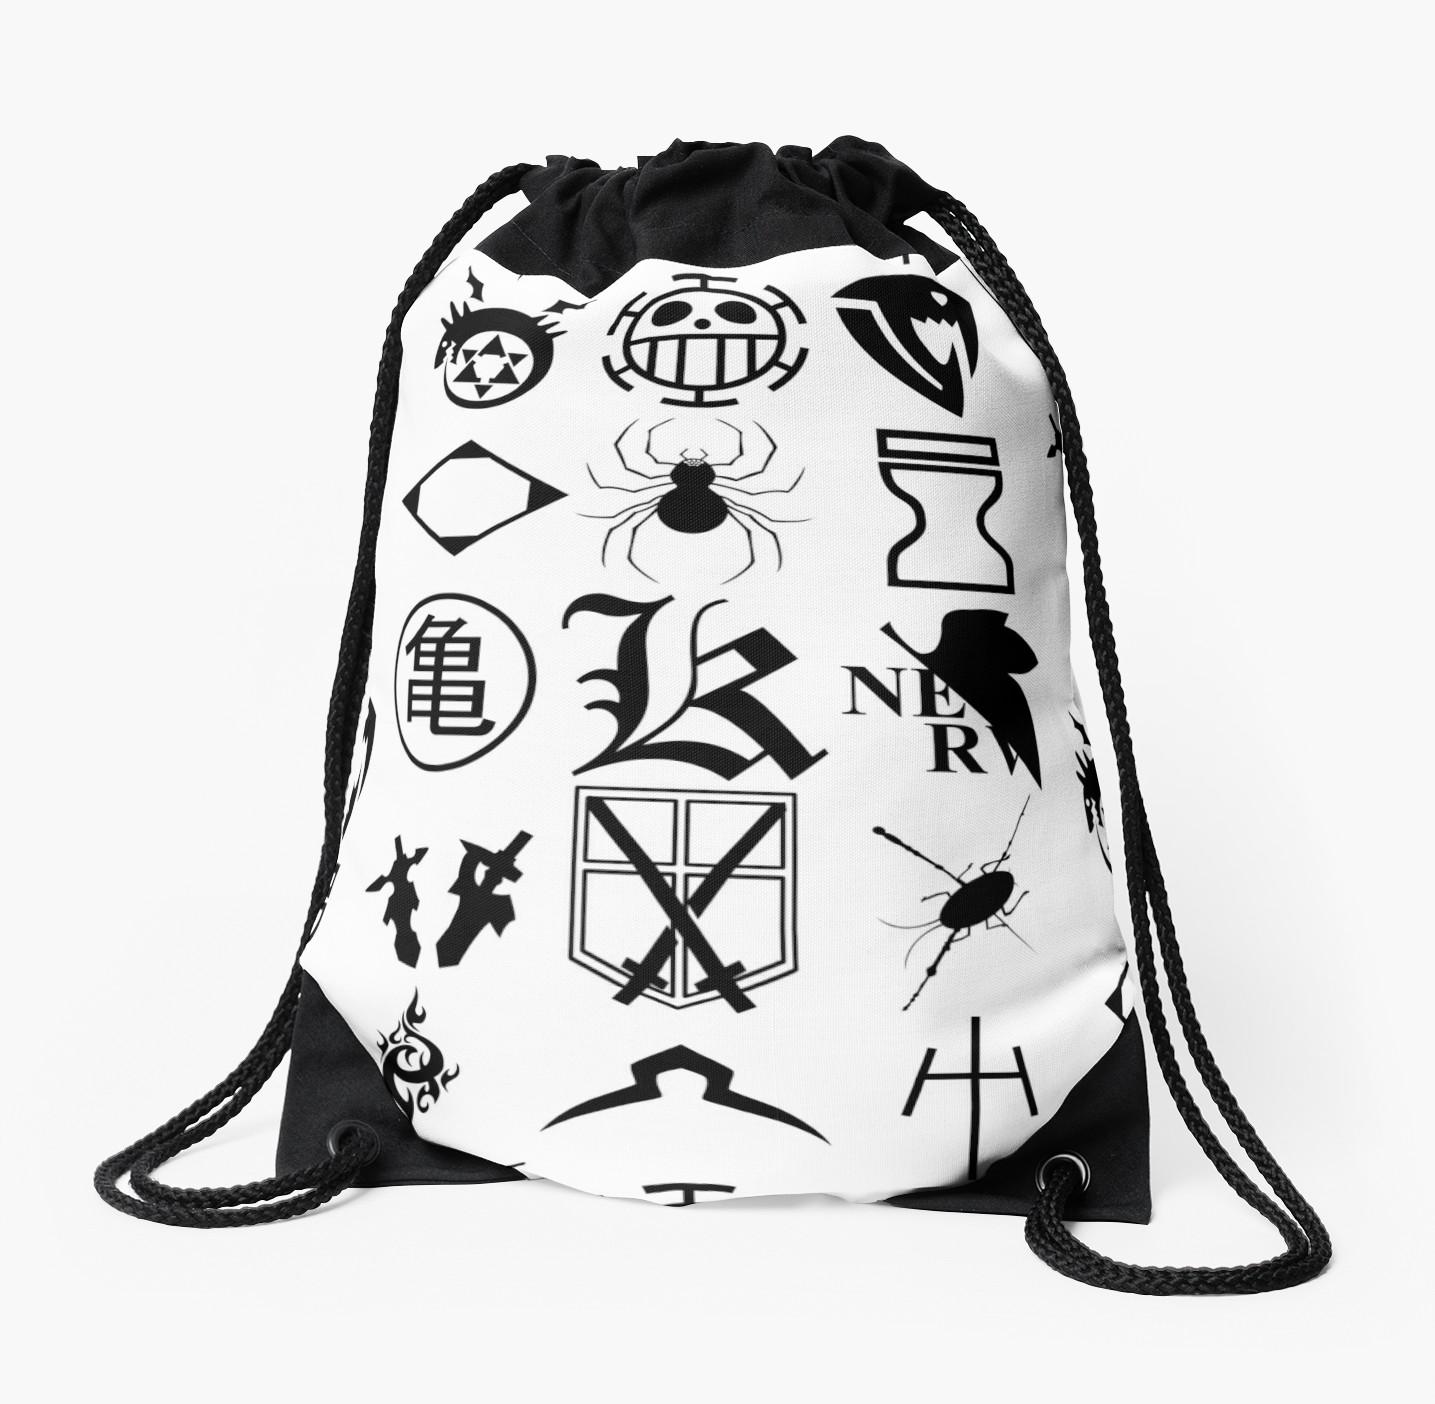 1435x1404 Anime Logos 2 Black Drawstring Bags By Yari27 Redbubble